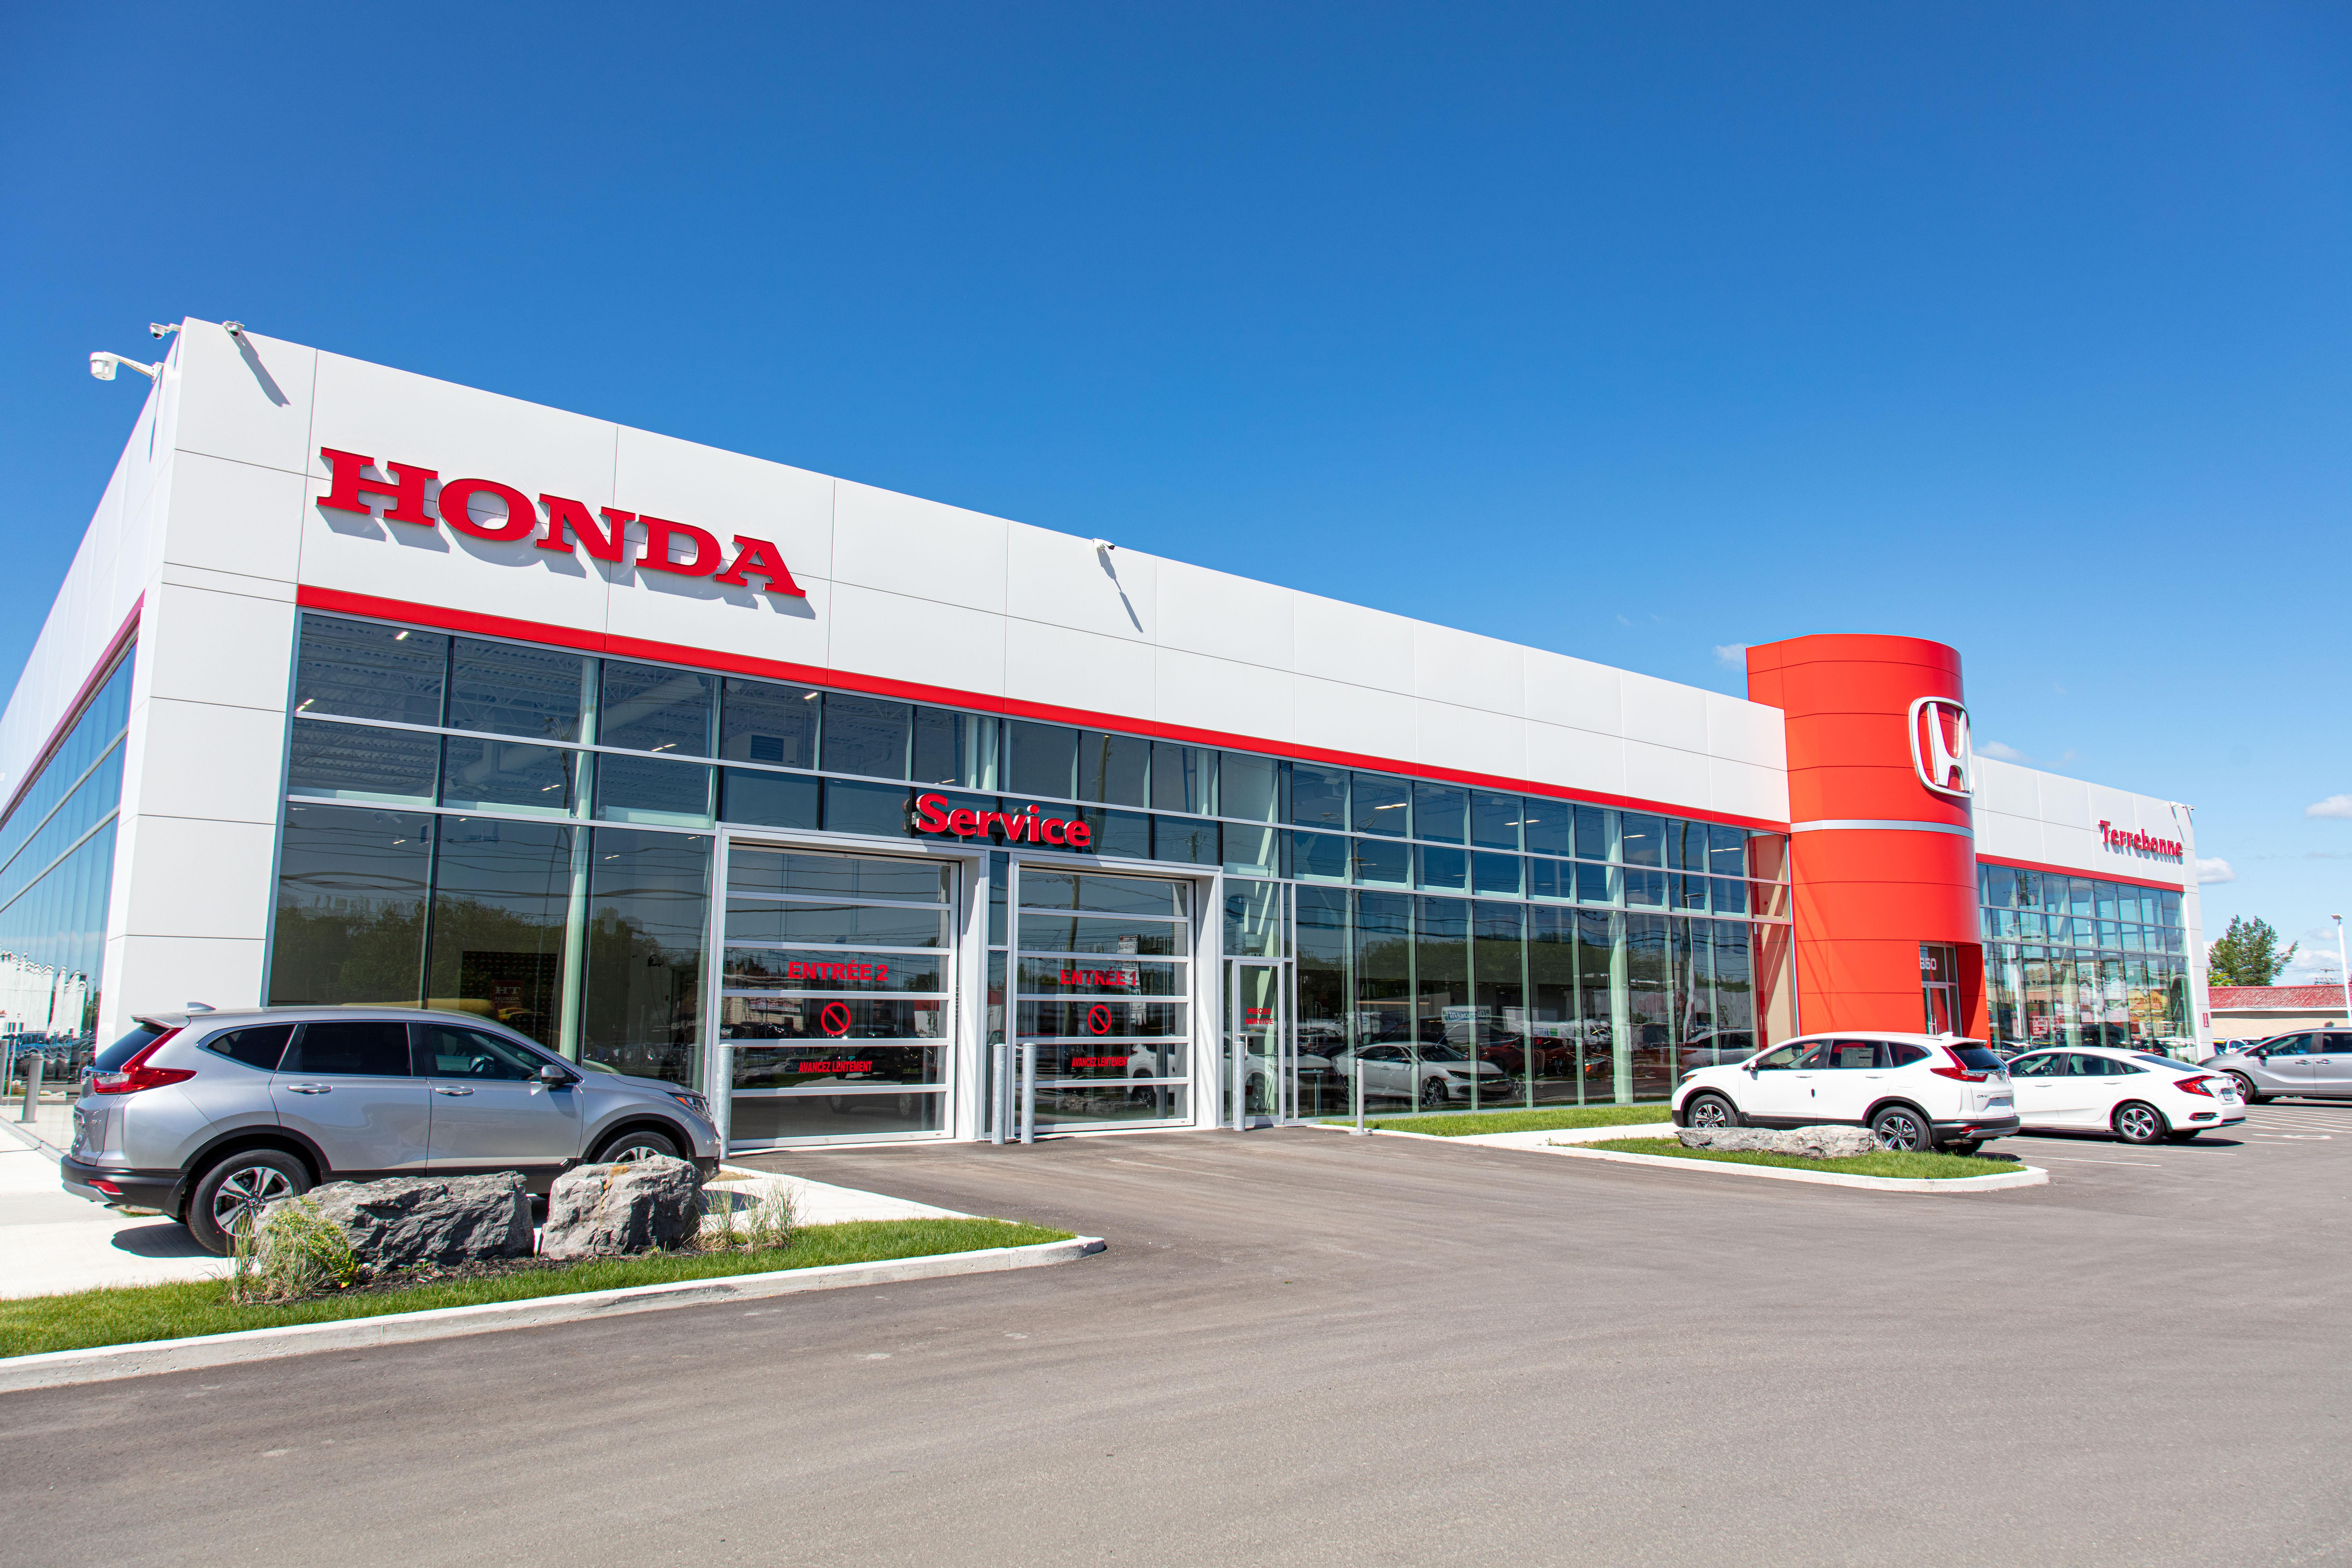 Honda terrebonne